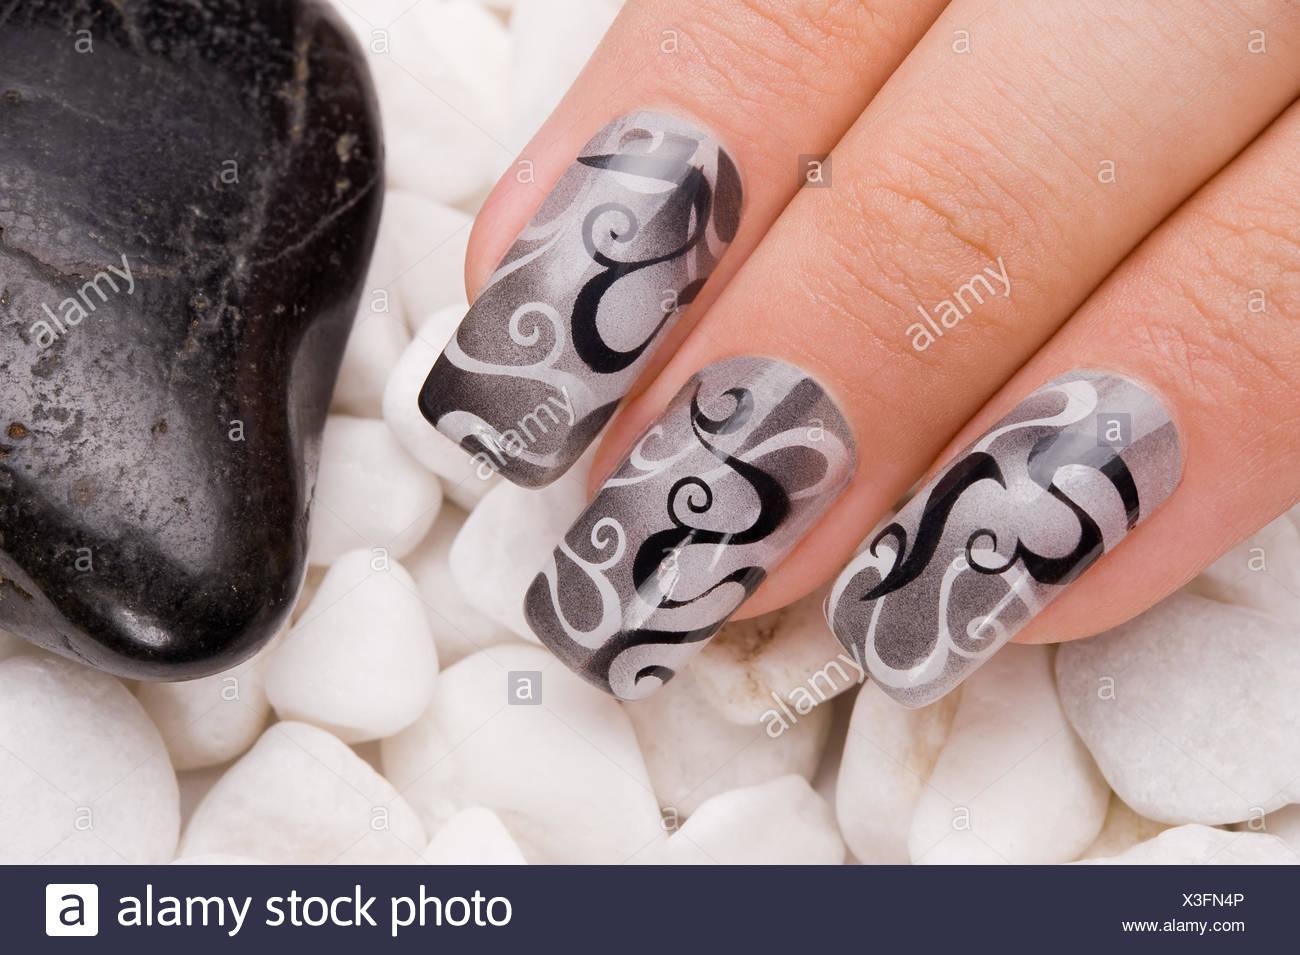 Fingernägel Stockfotos & Fingernägel Bilder - Alamy